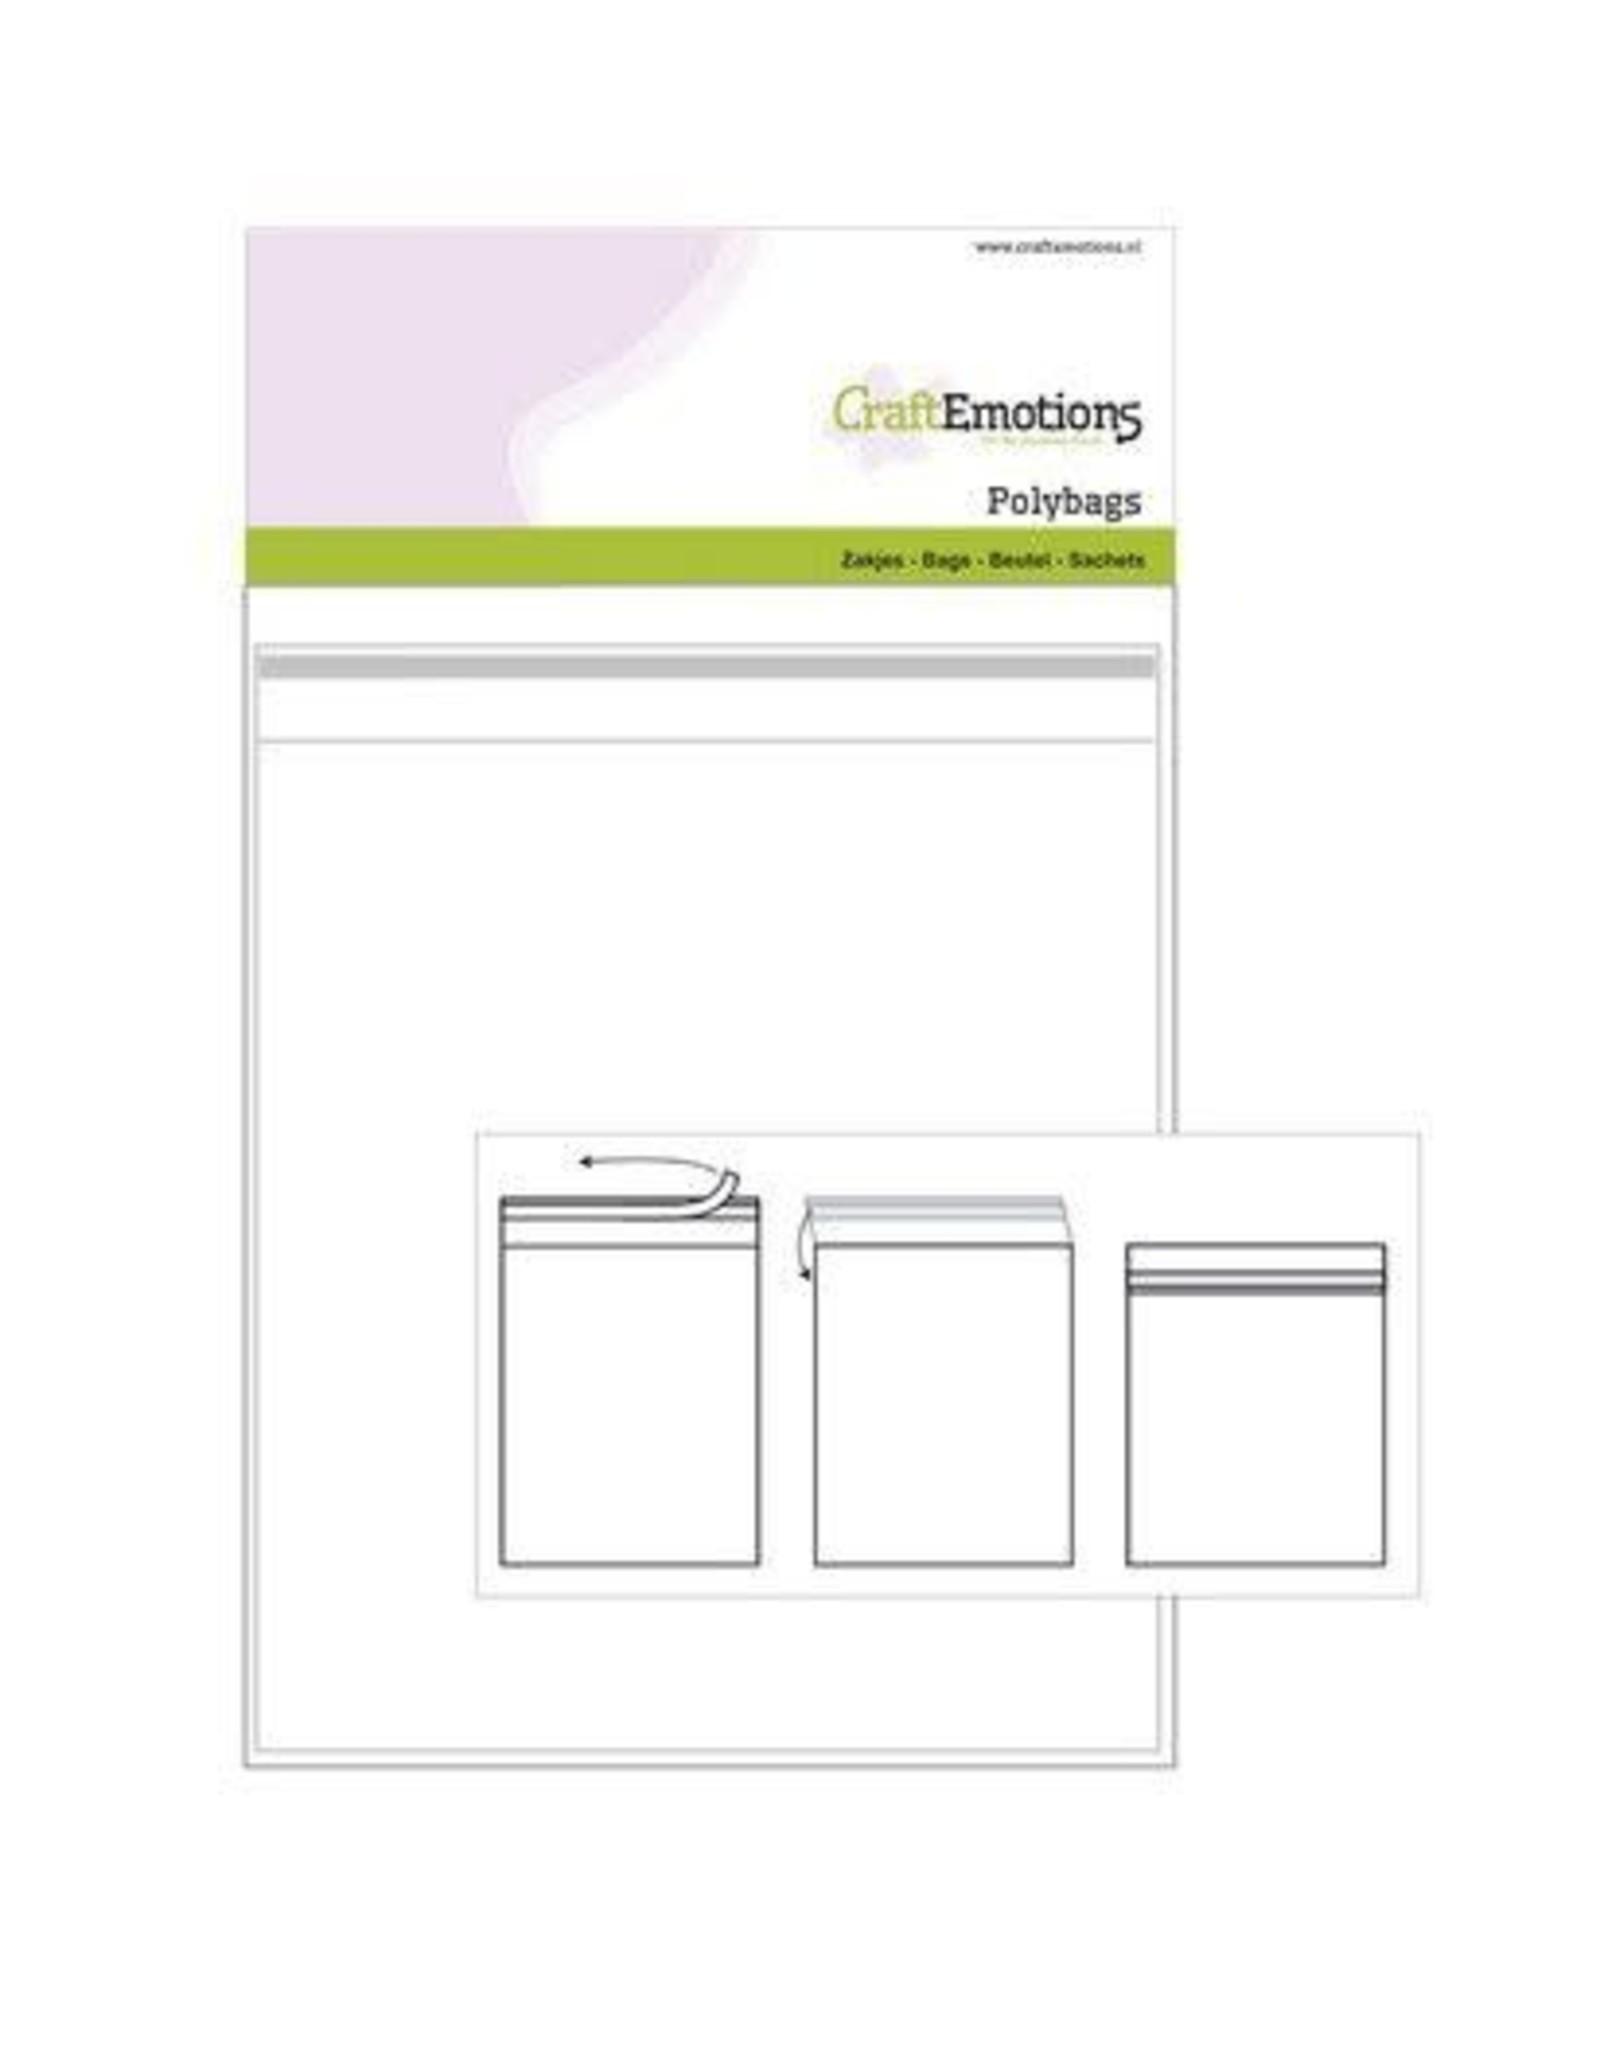 Craft Emotions CraftEmotions Zakjes zelfsluitend transparant 25st 152mmx152mm - Polybags